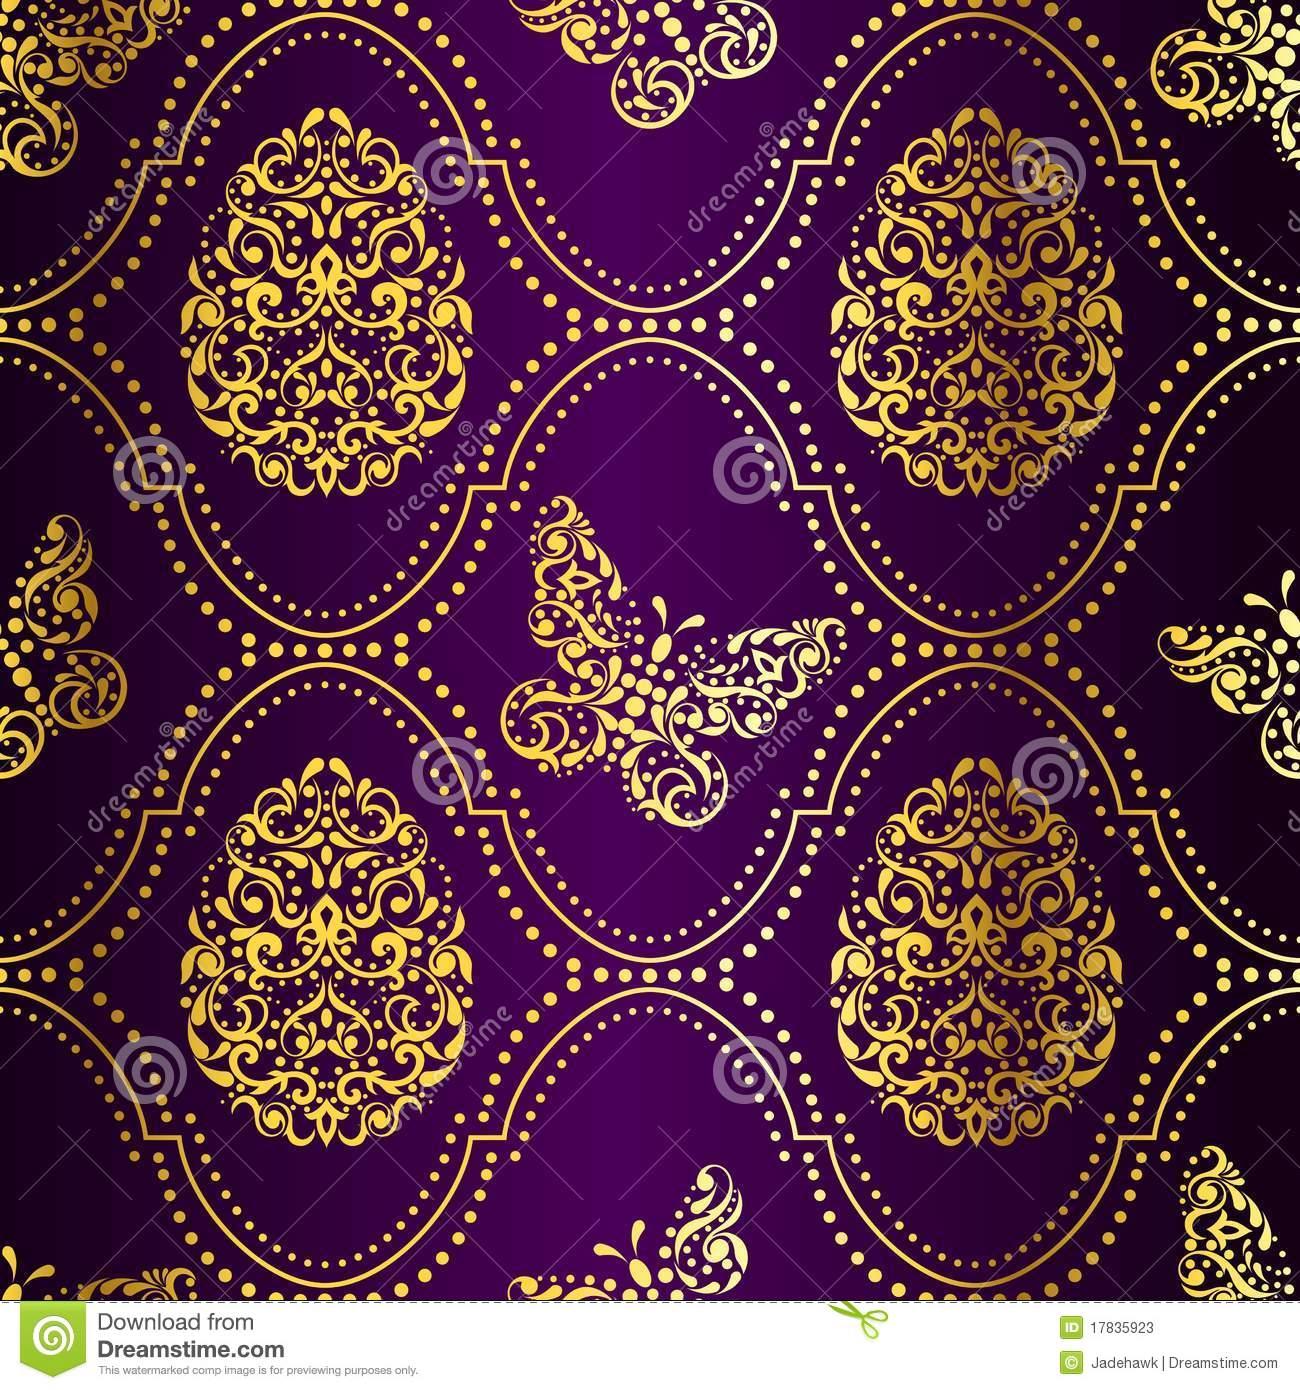 purple gold wallpaper wallpapersafari. Black Bedroom Furniture Sets. Home Design Ideas